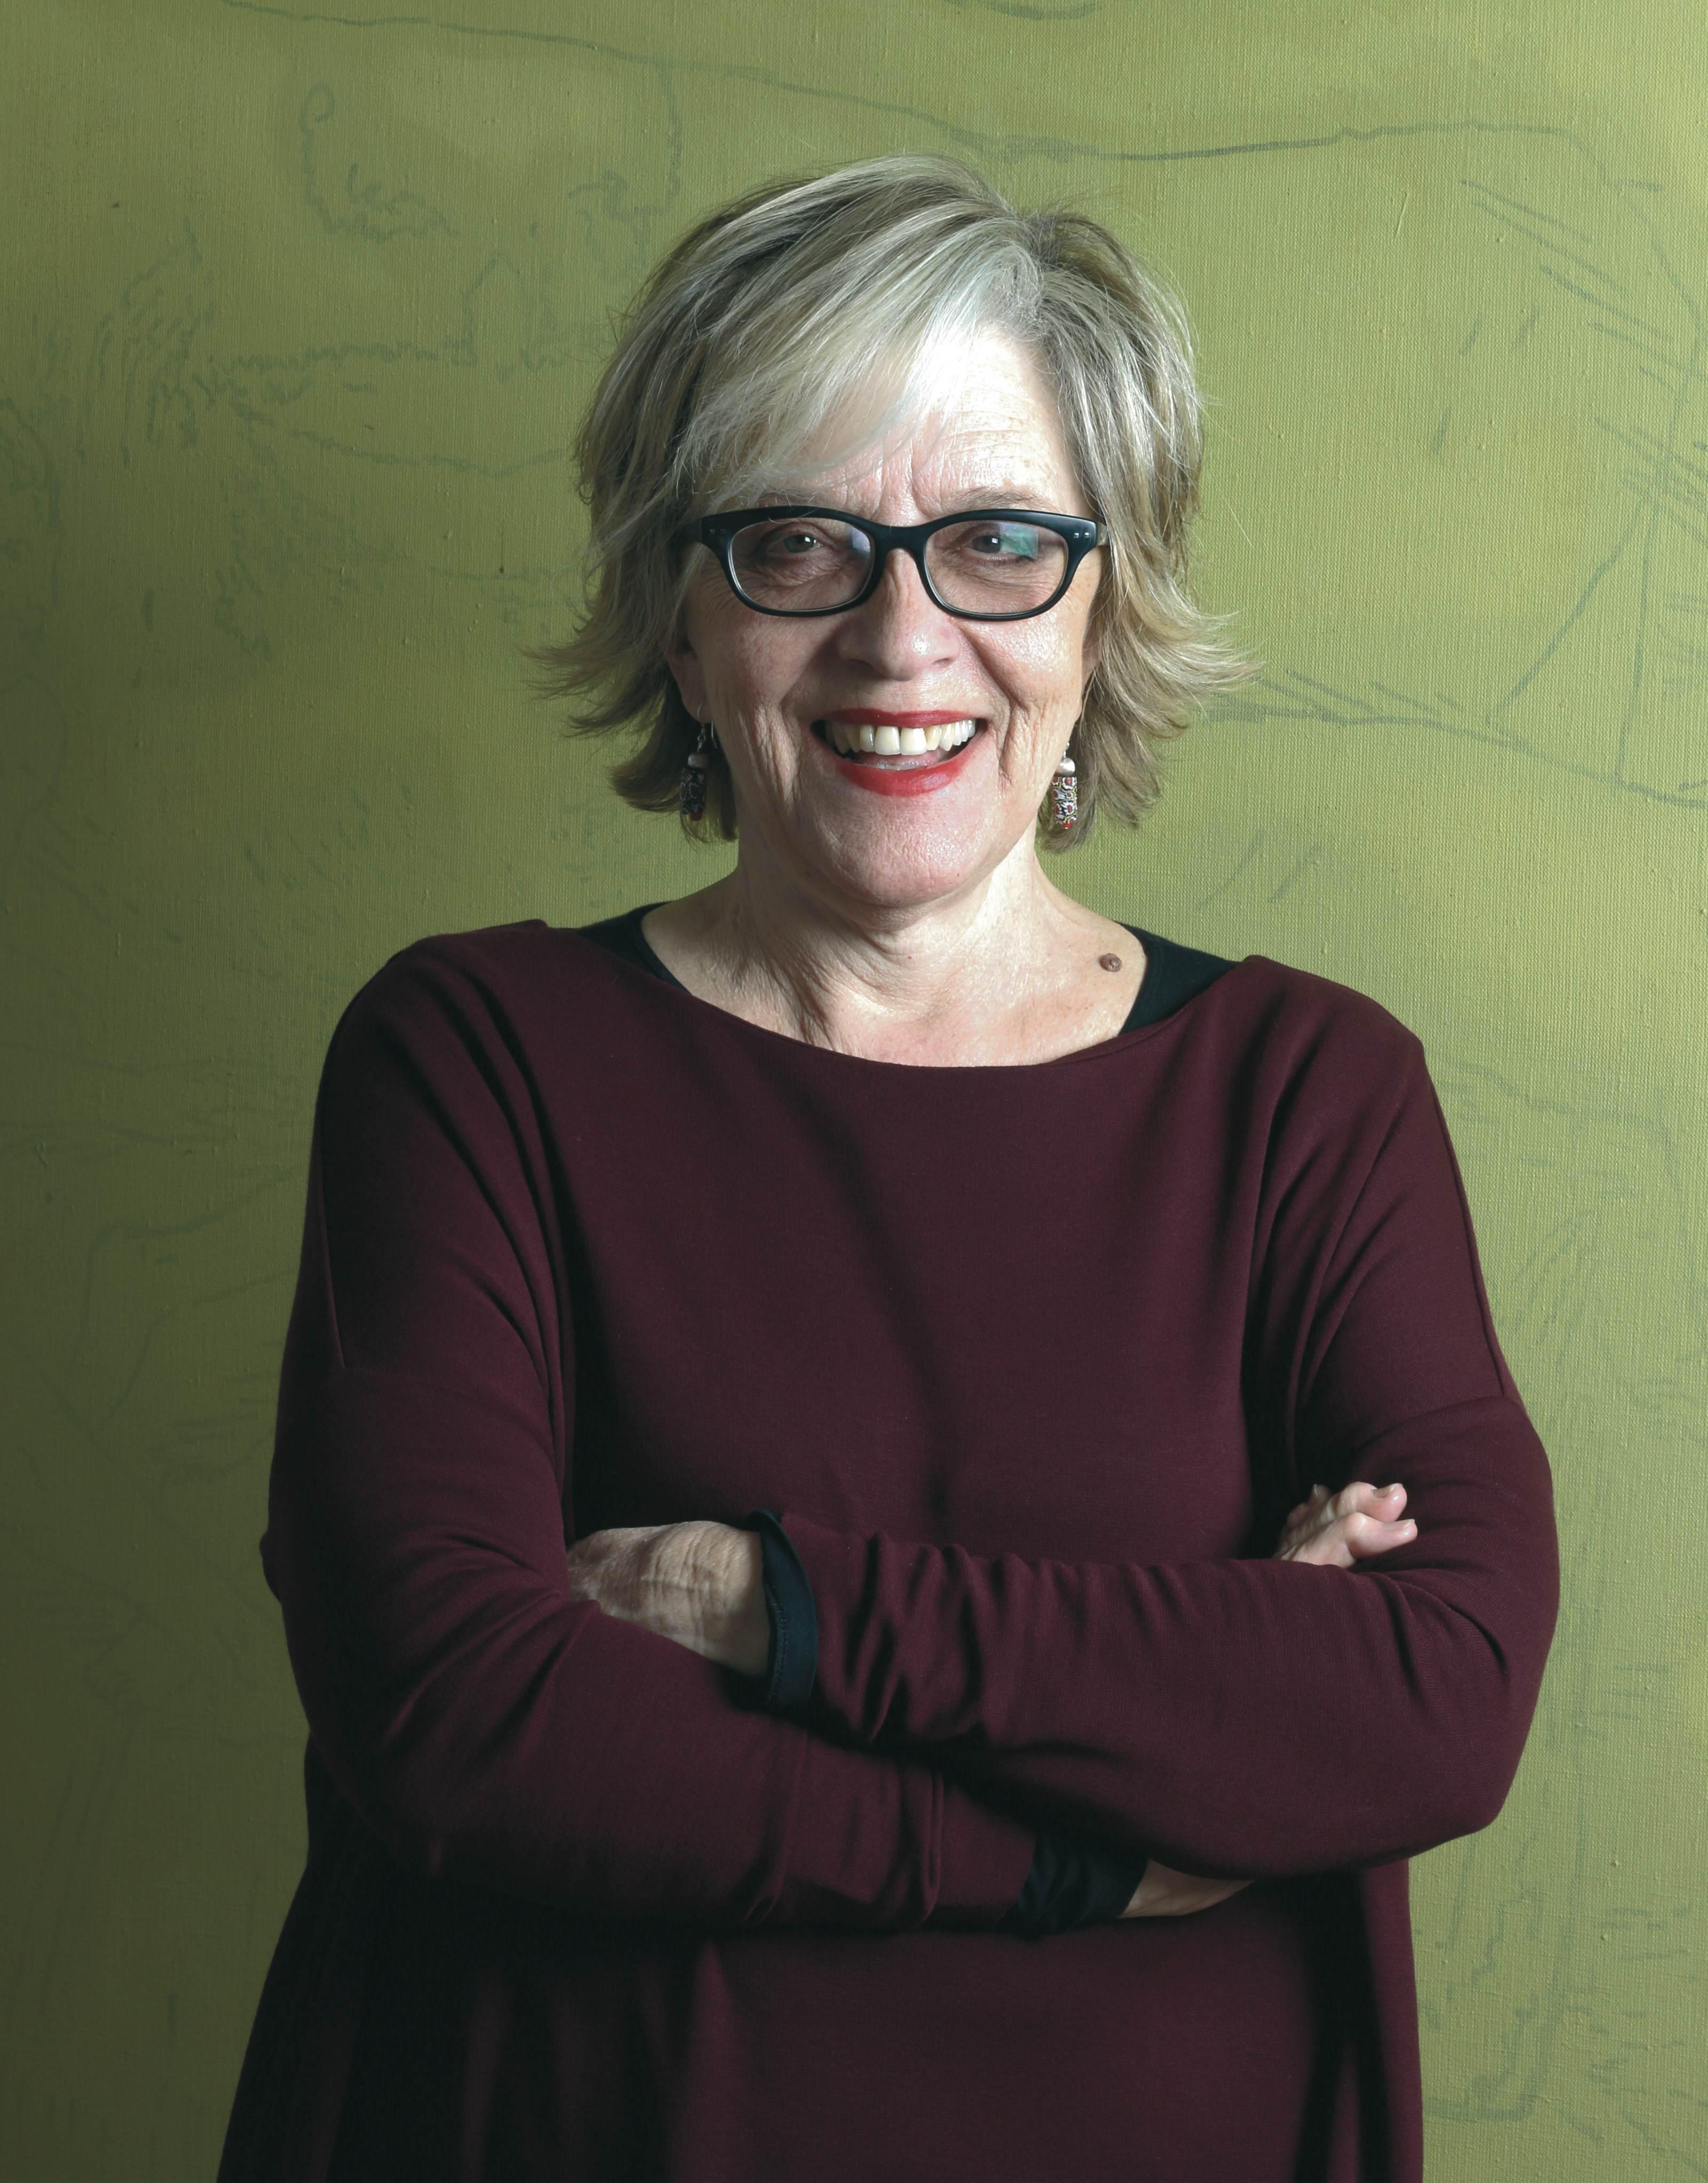 Slavenka Drakulić dobila je međunarodnu nagradu Stefan Heym